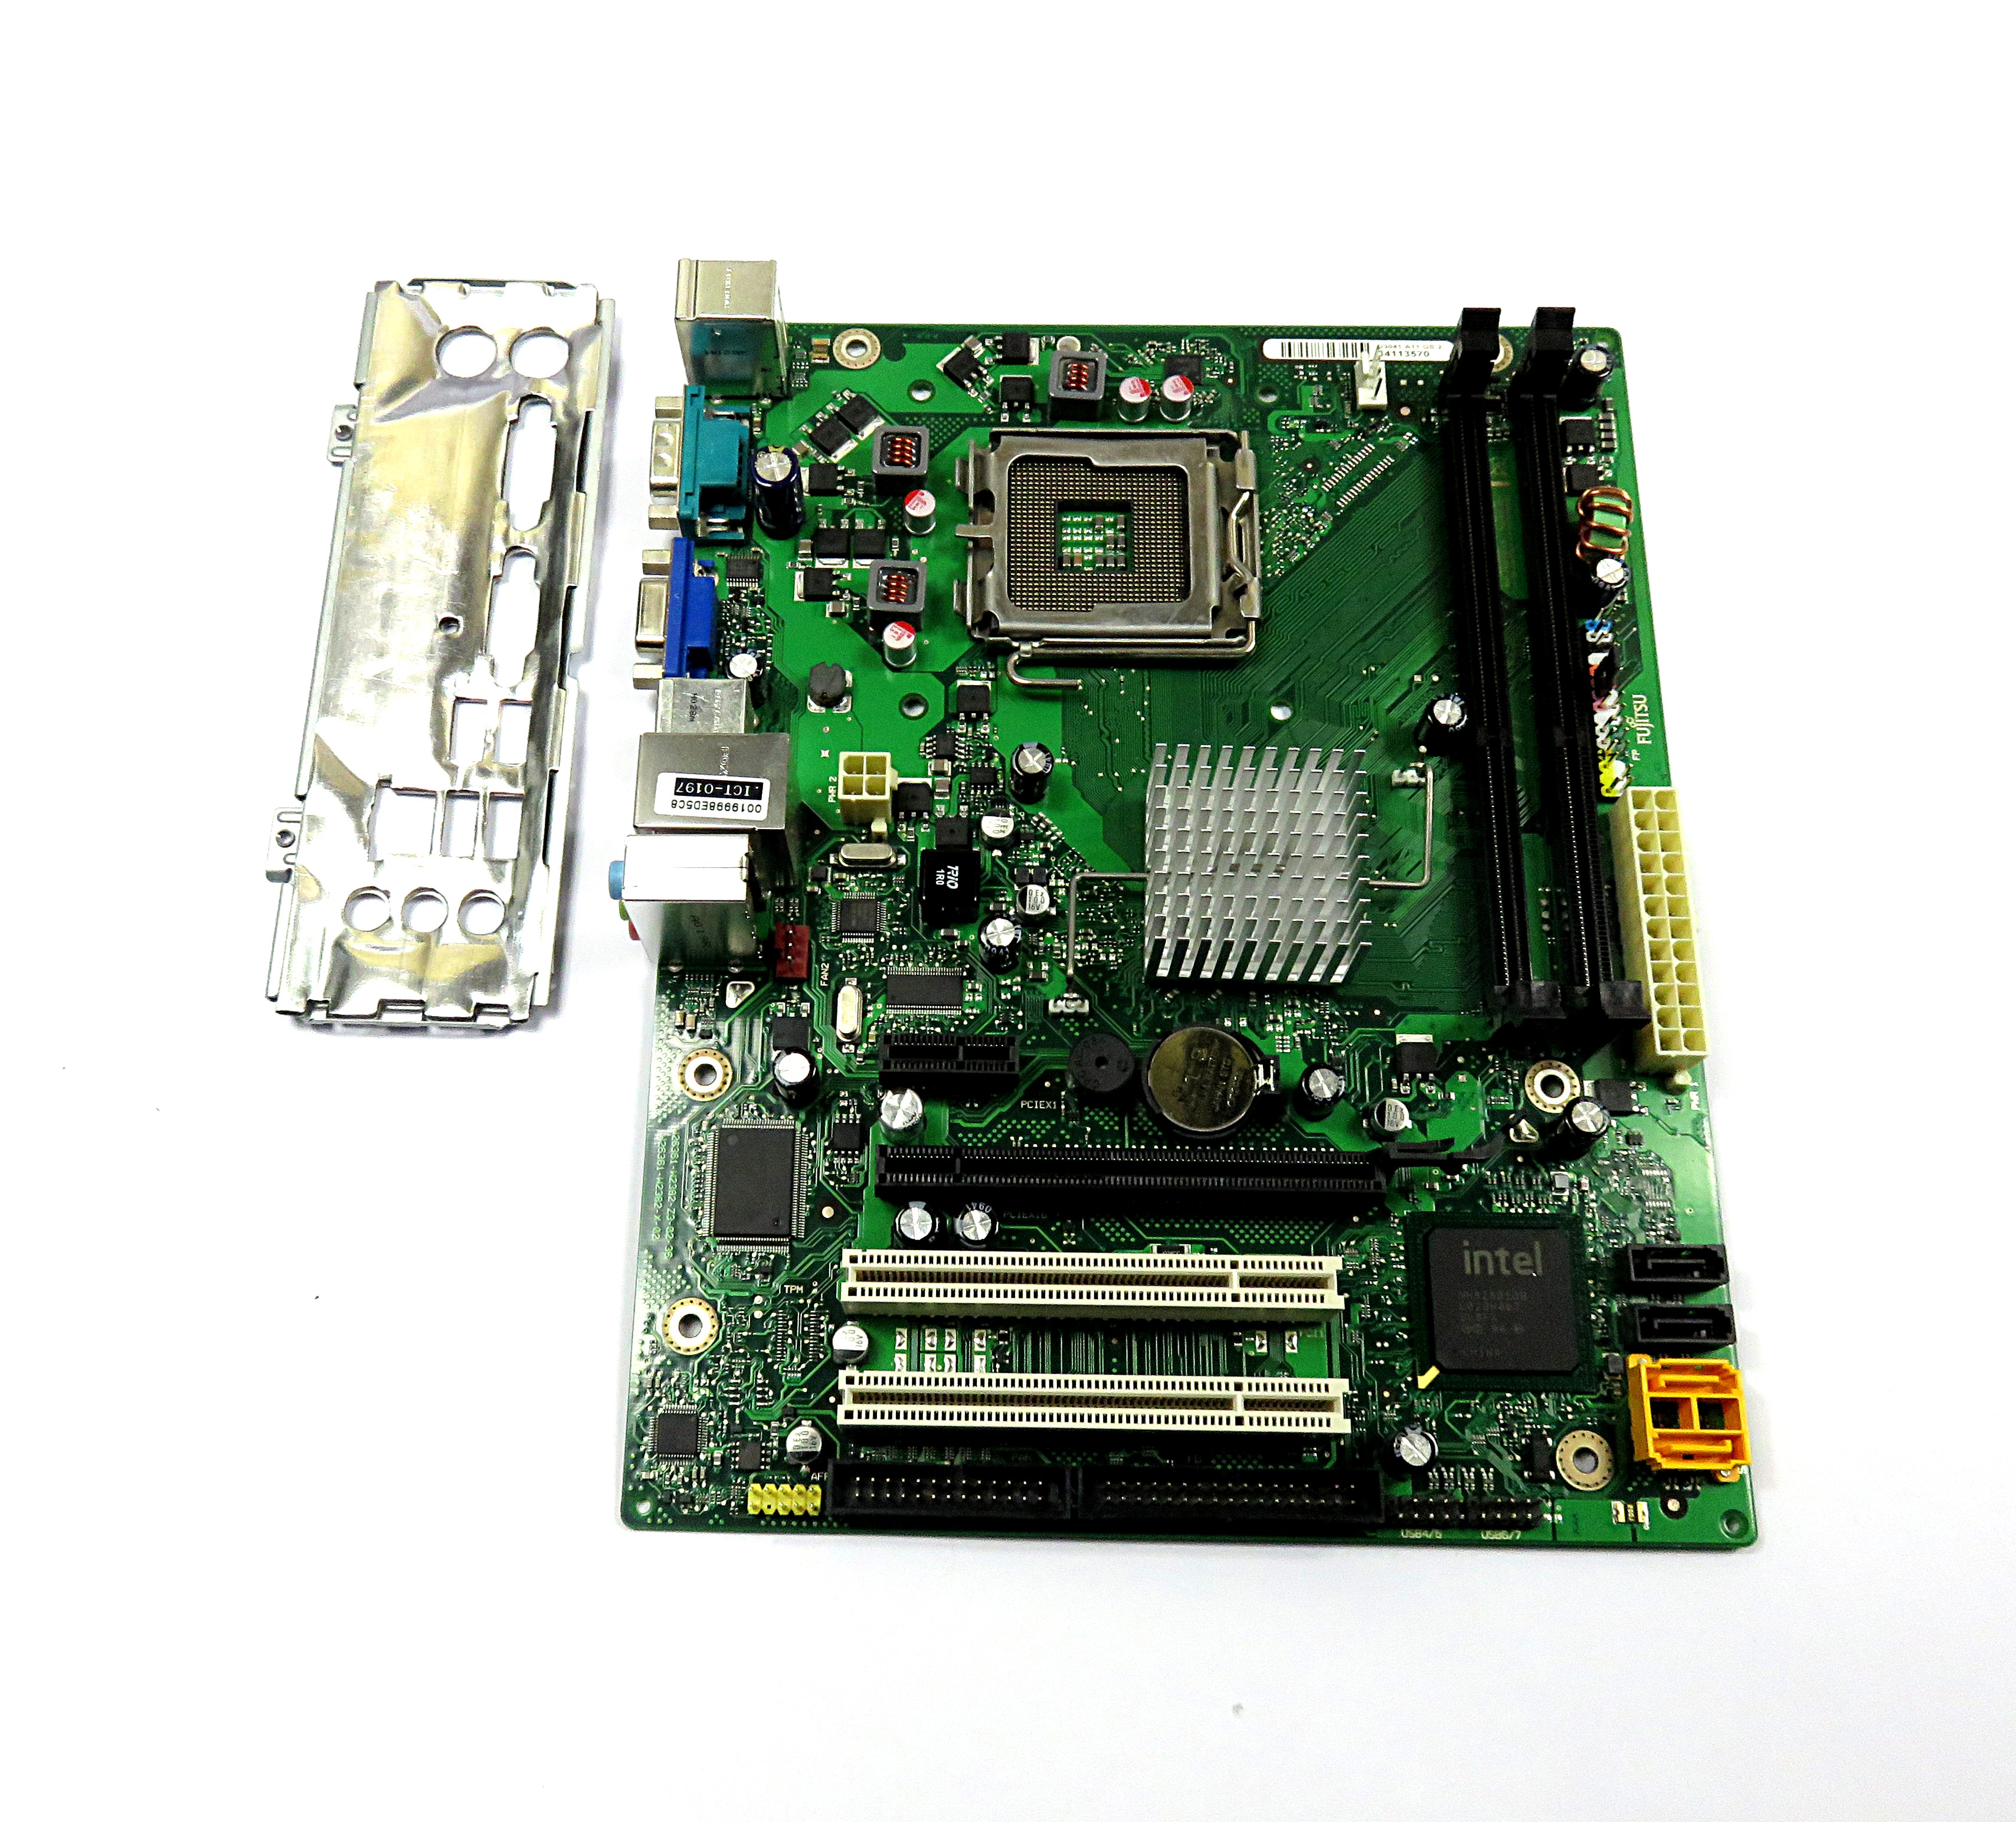 D3041-A11 Fujitsu Esprimo P2560 Socket 775 Motherboard